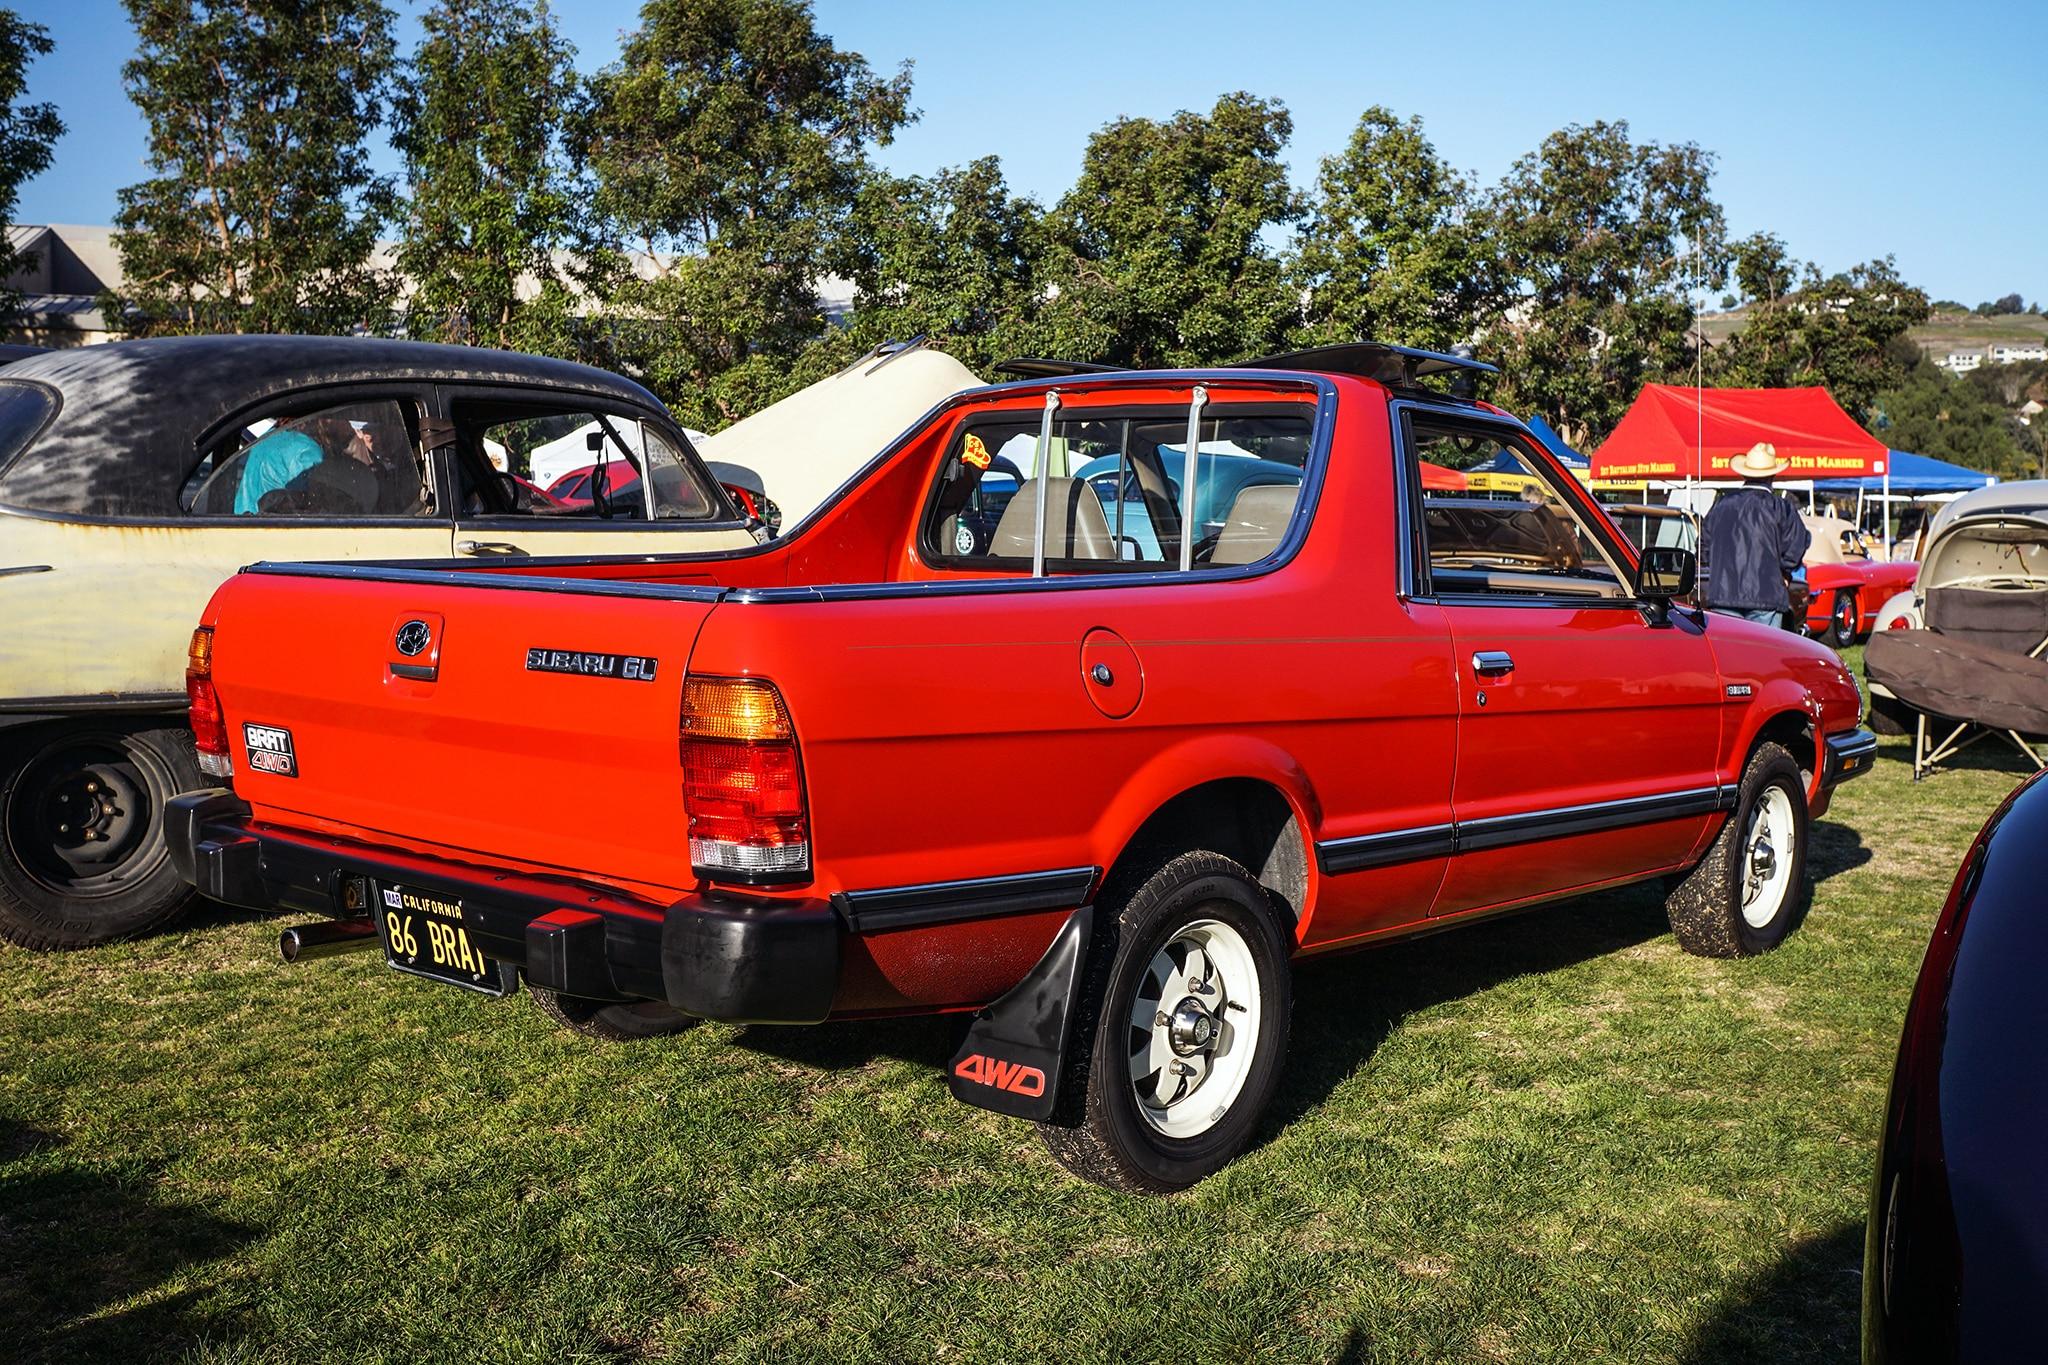 Six Cool Cars We Spotted At The San Juan Capistrano Car Show - Subaru car show california